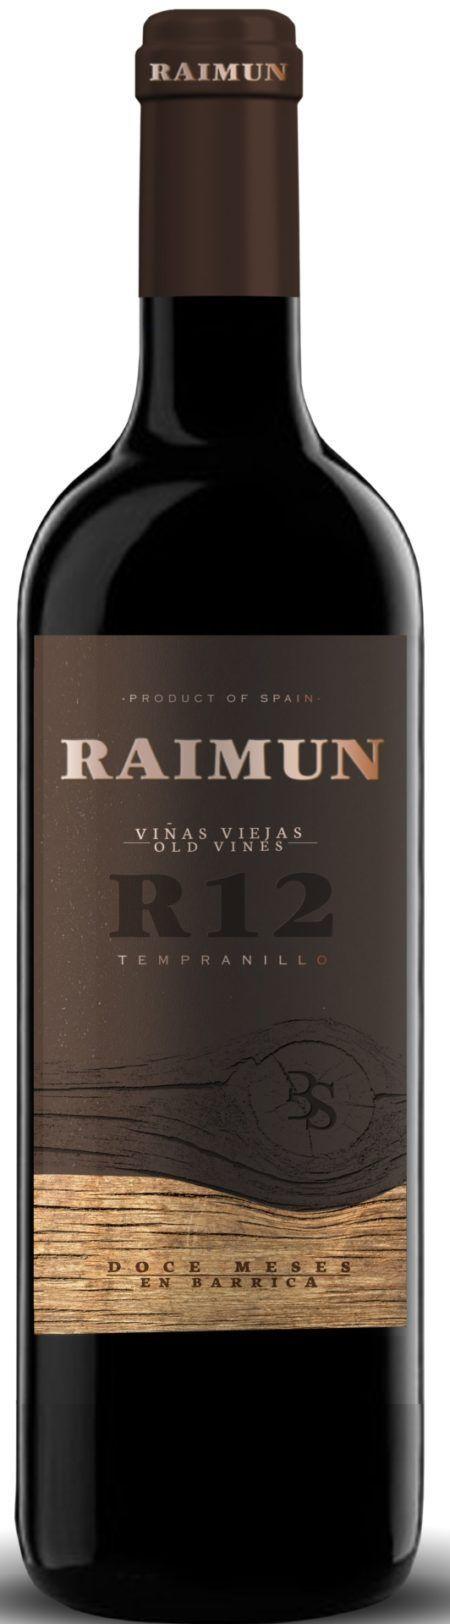 Sinforiano Tempranillo Rode Spaanse Wijn Castilla y Leon Raimun 12 meses